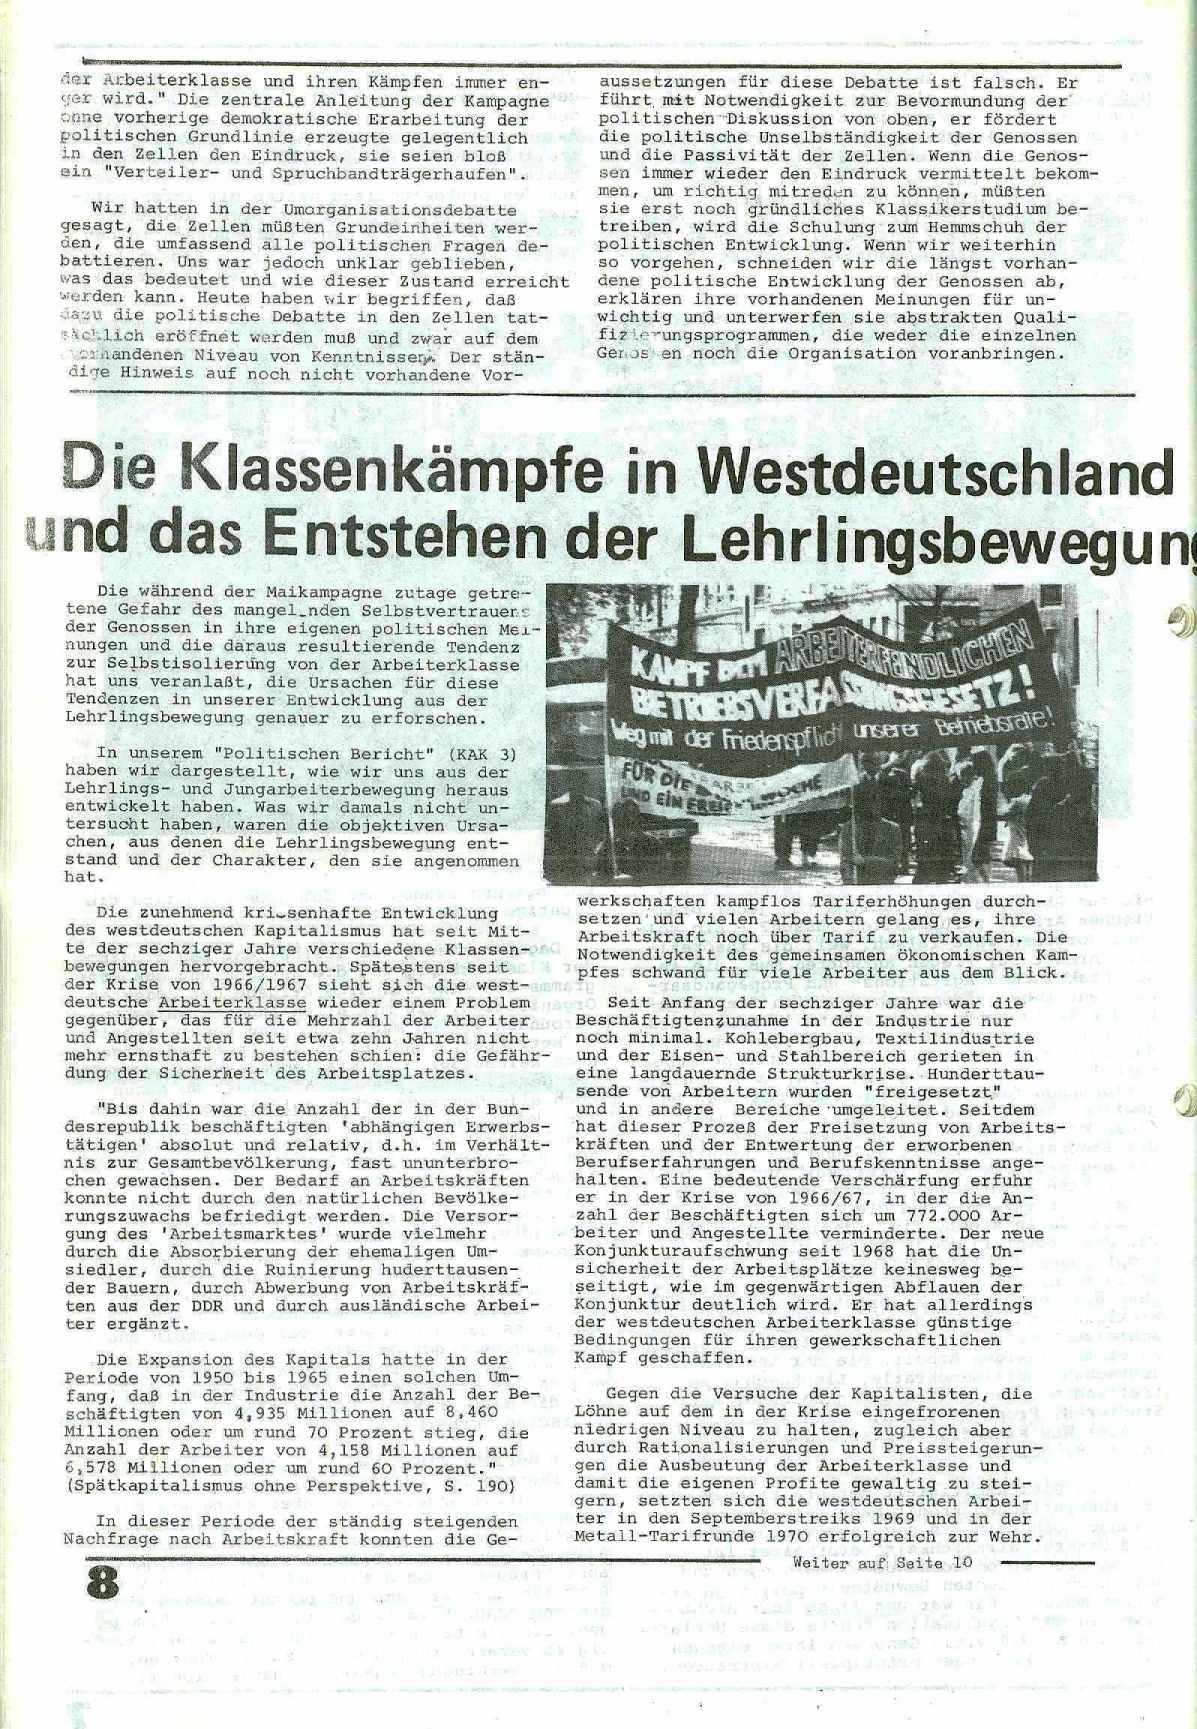 Bremen_KAK097